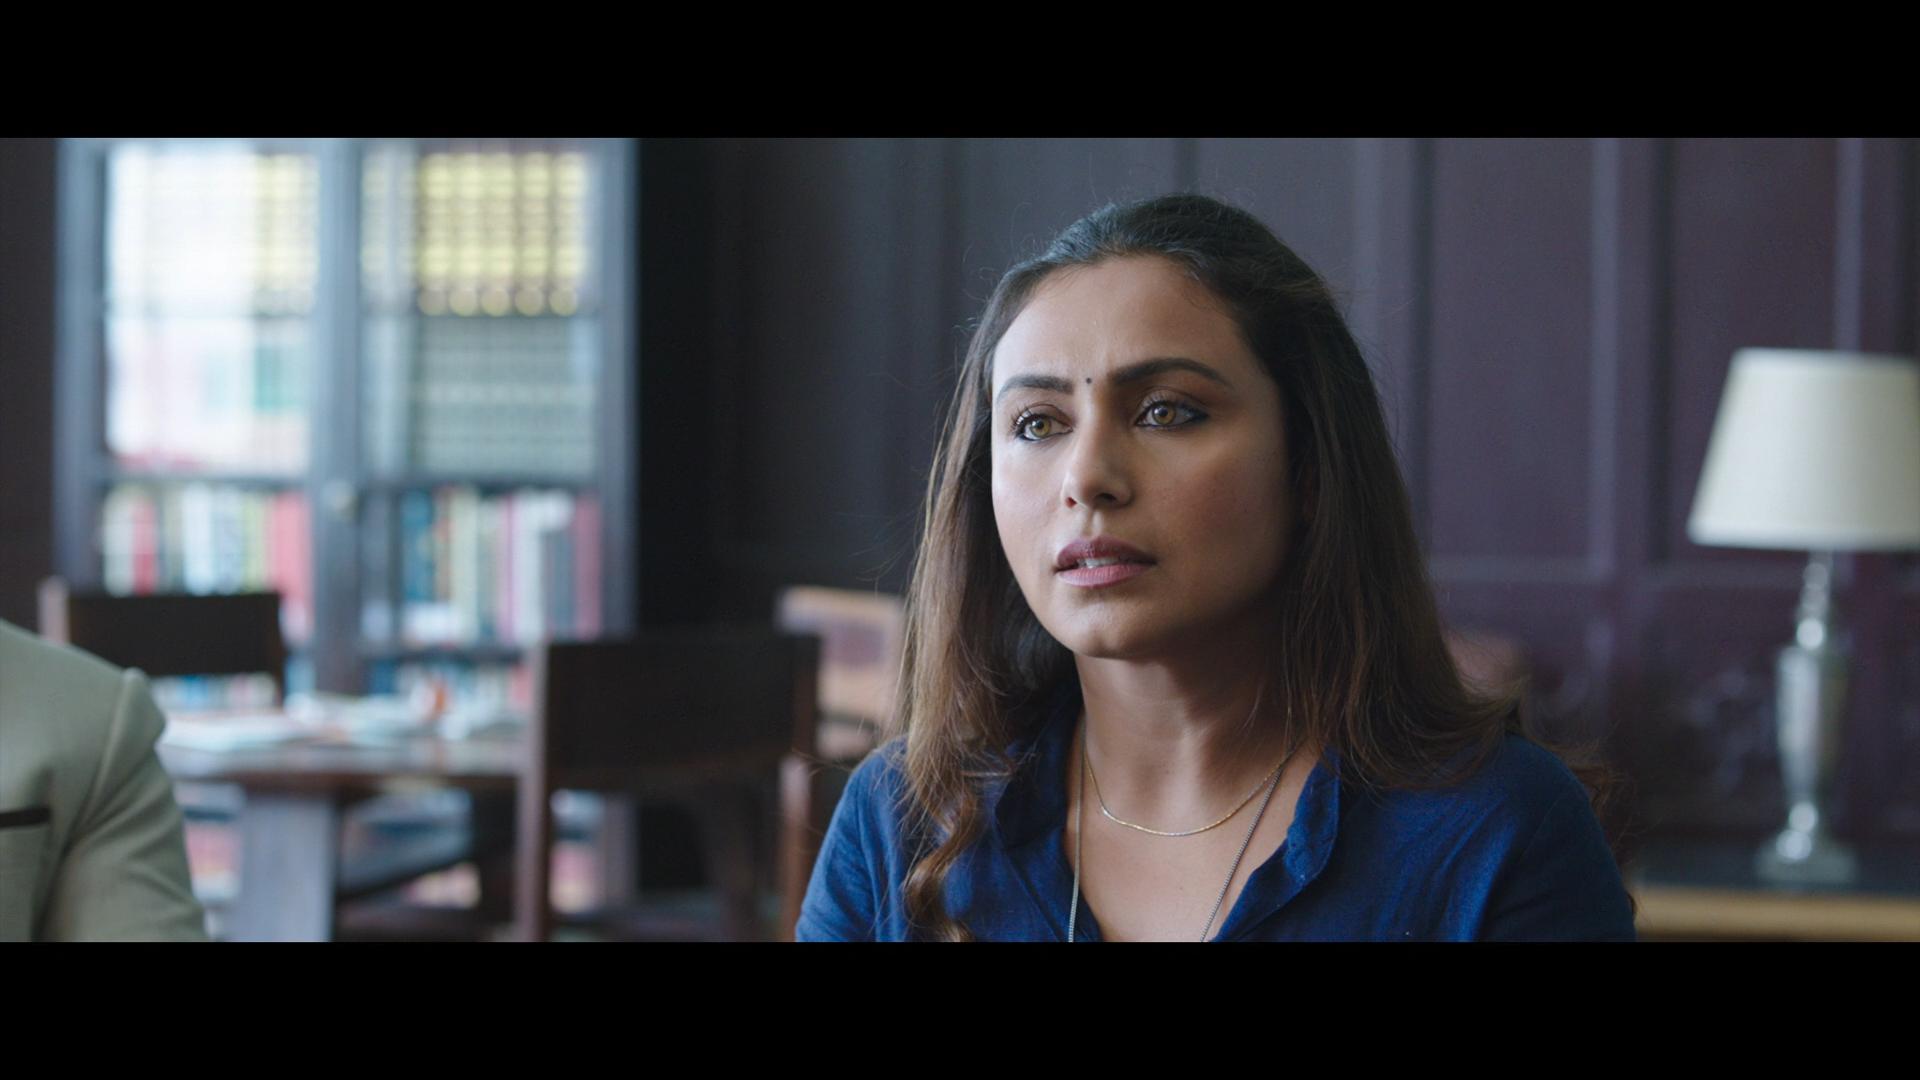 Hichki (2018) 1080p BluRay Remux AVC Atmos 7.1-FraMeSToR